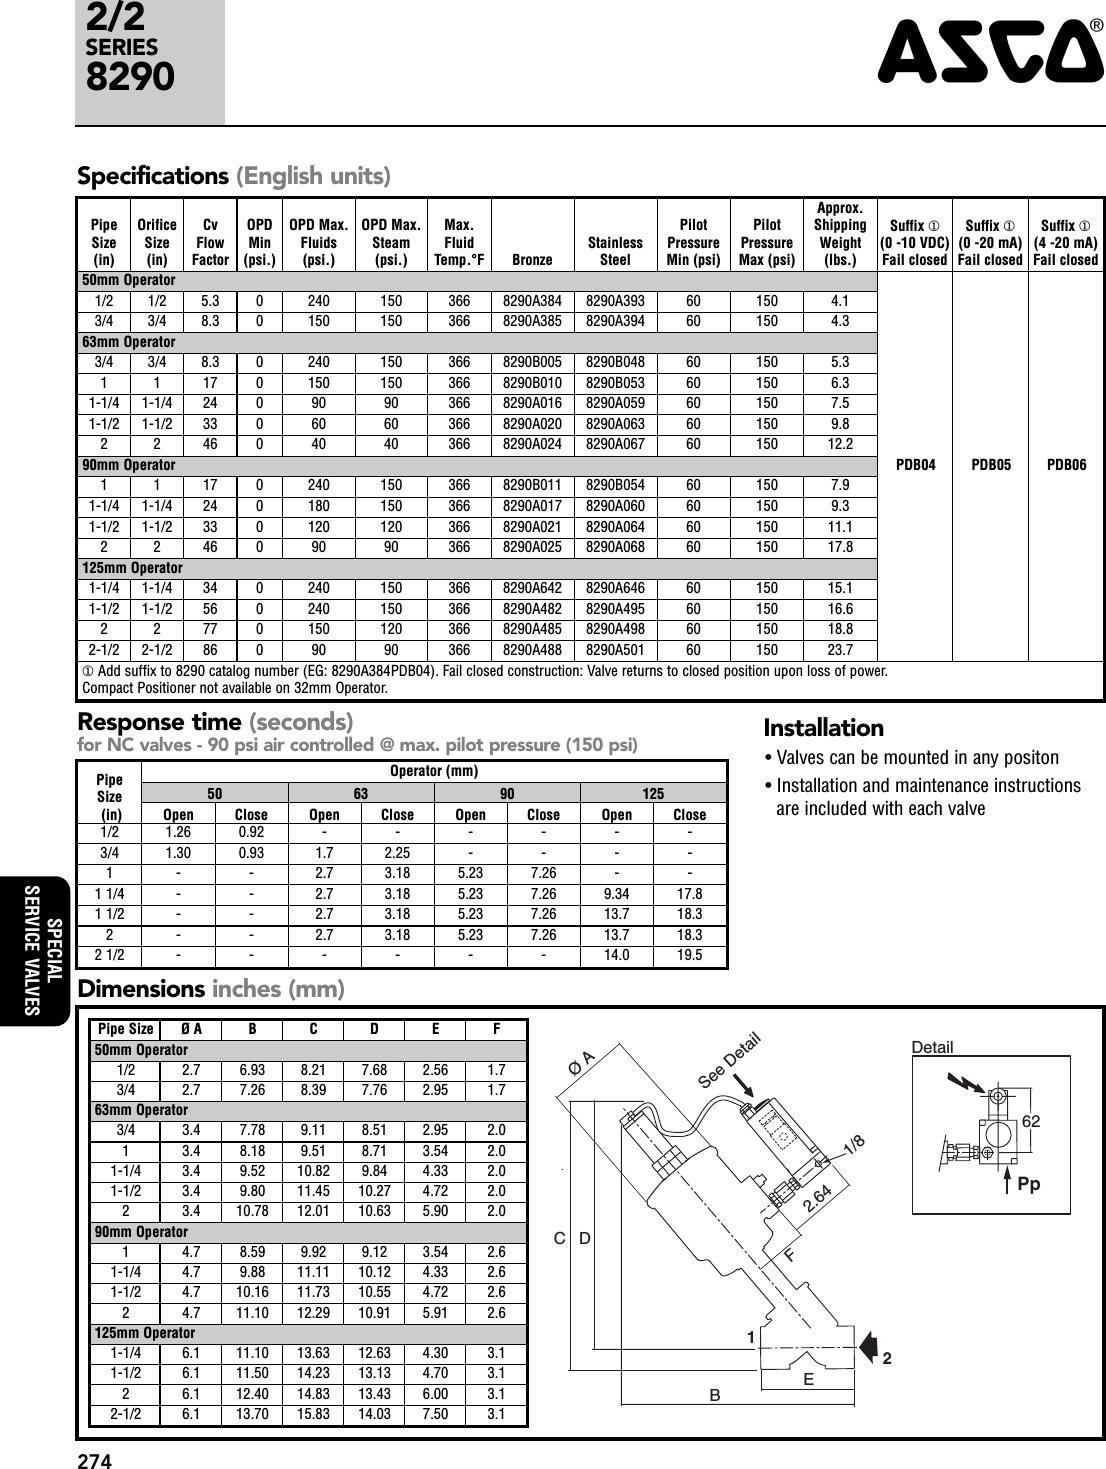 Genz Benz Wiring Diagrams Electrical Asco 8290 Diagram Schematics U2022 Guitar Speaker Cabinets